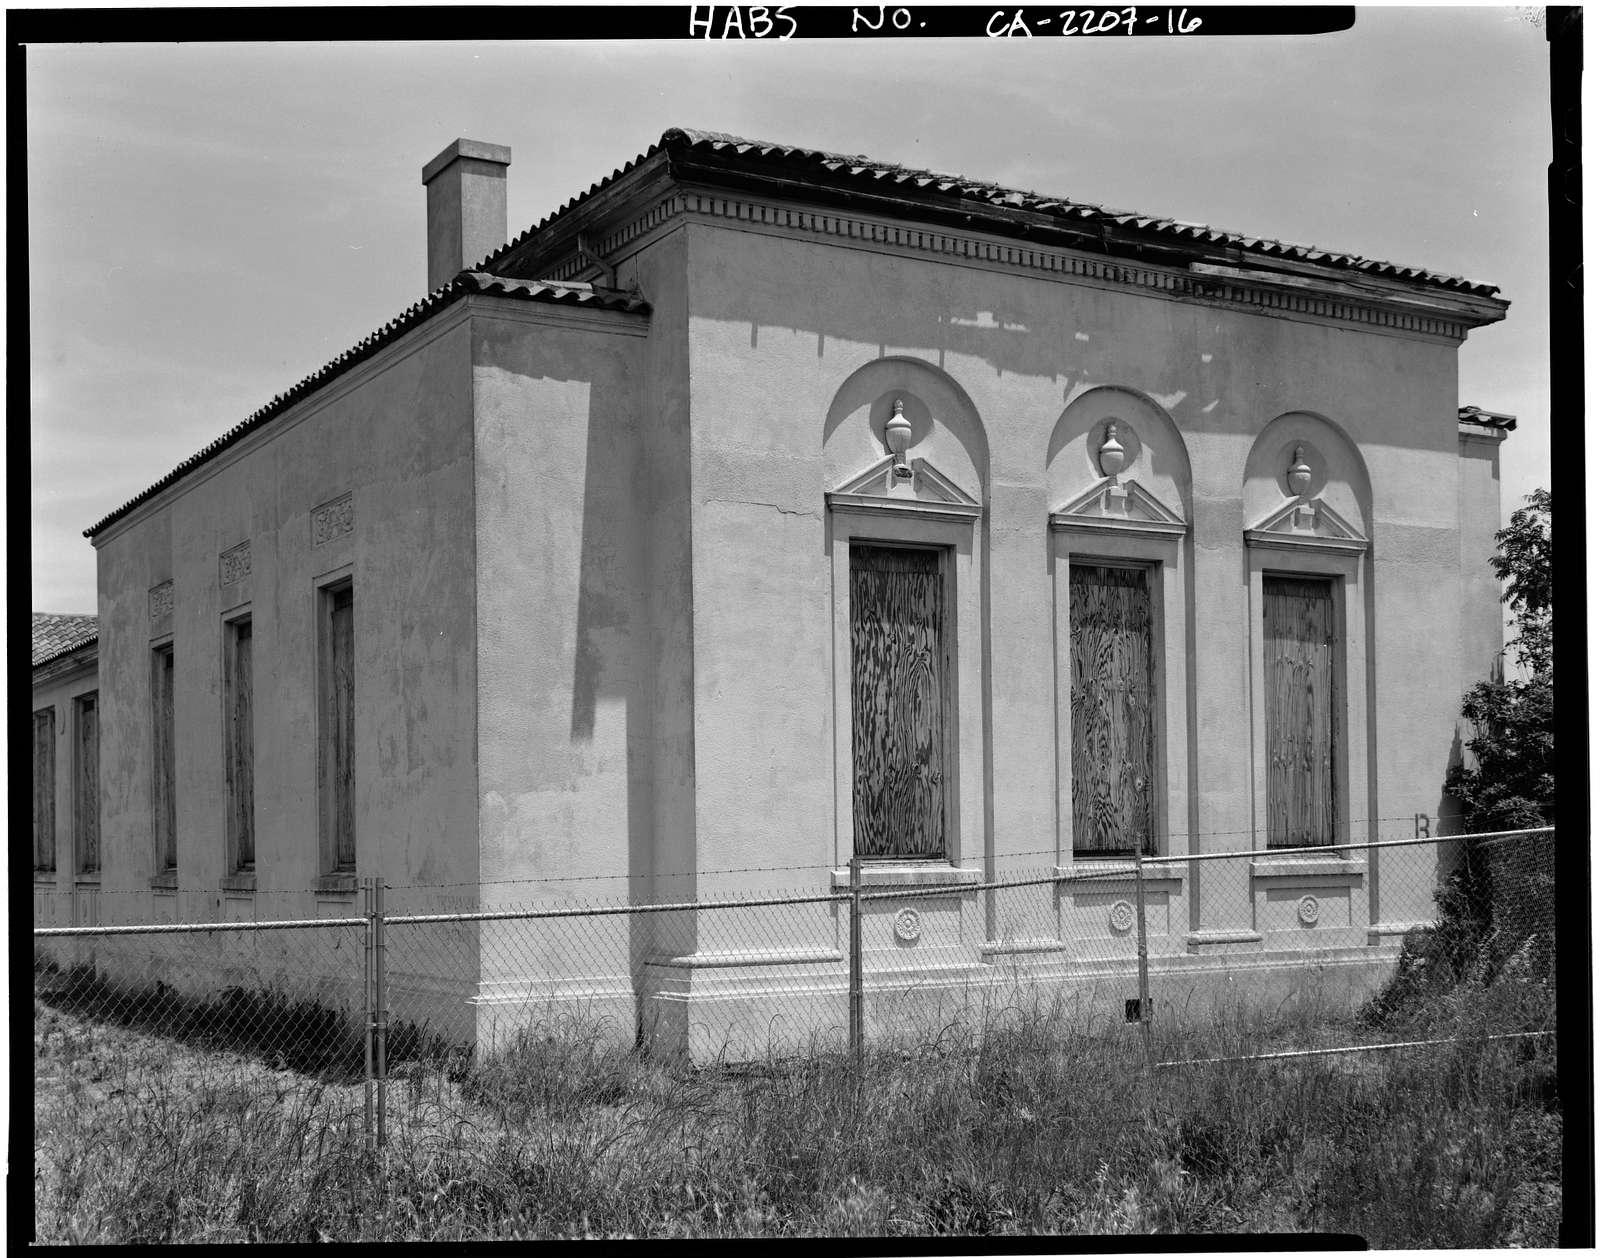 Campbell Union Grammar School, 11 East Campbell Avenue, Campbell, Santa Clara County, CA